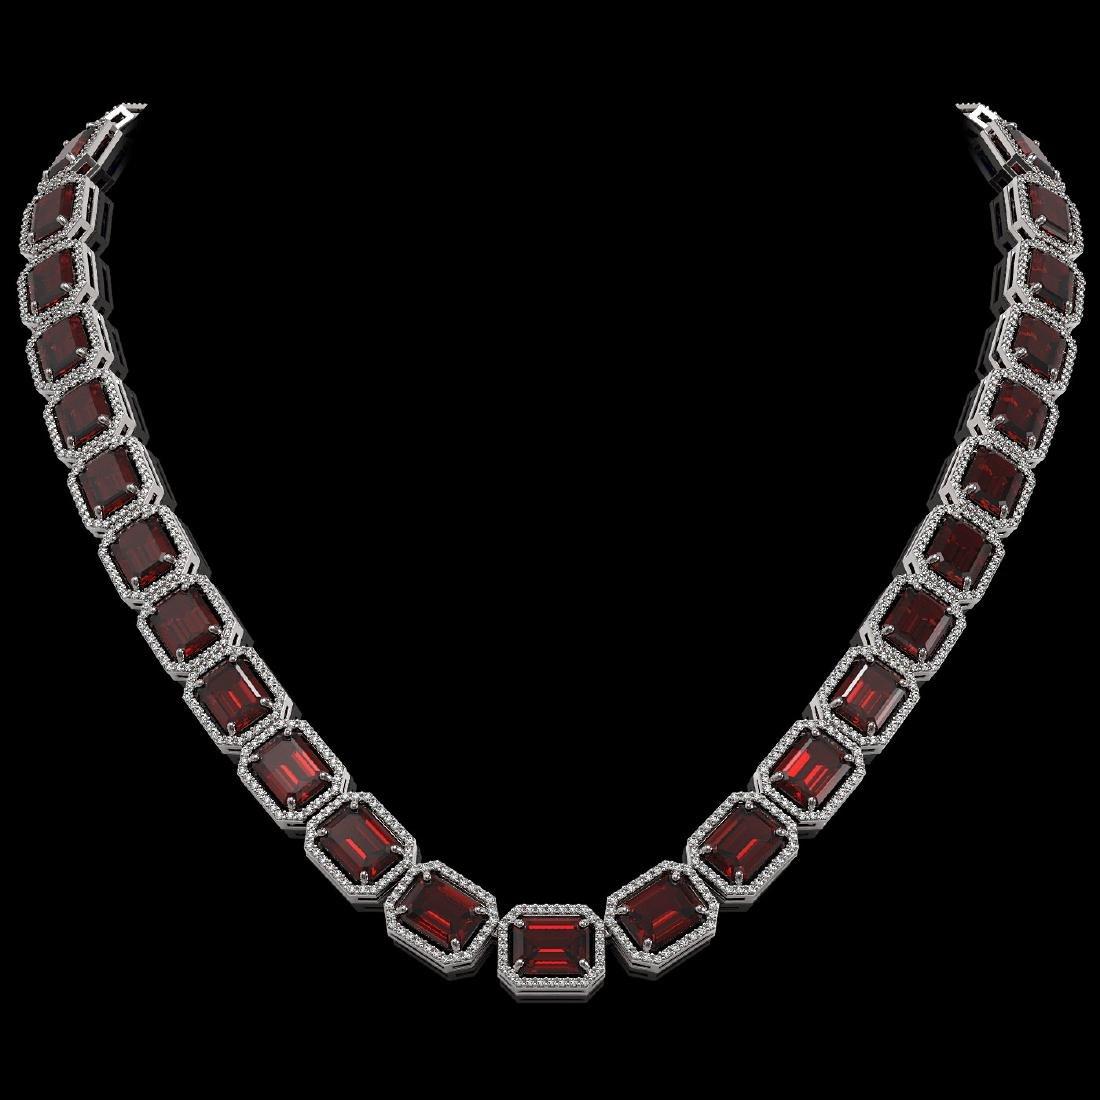 73.44 CTW Garnet & Diamond Halo Necklace 10K White Gold